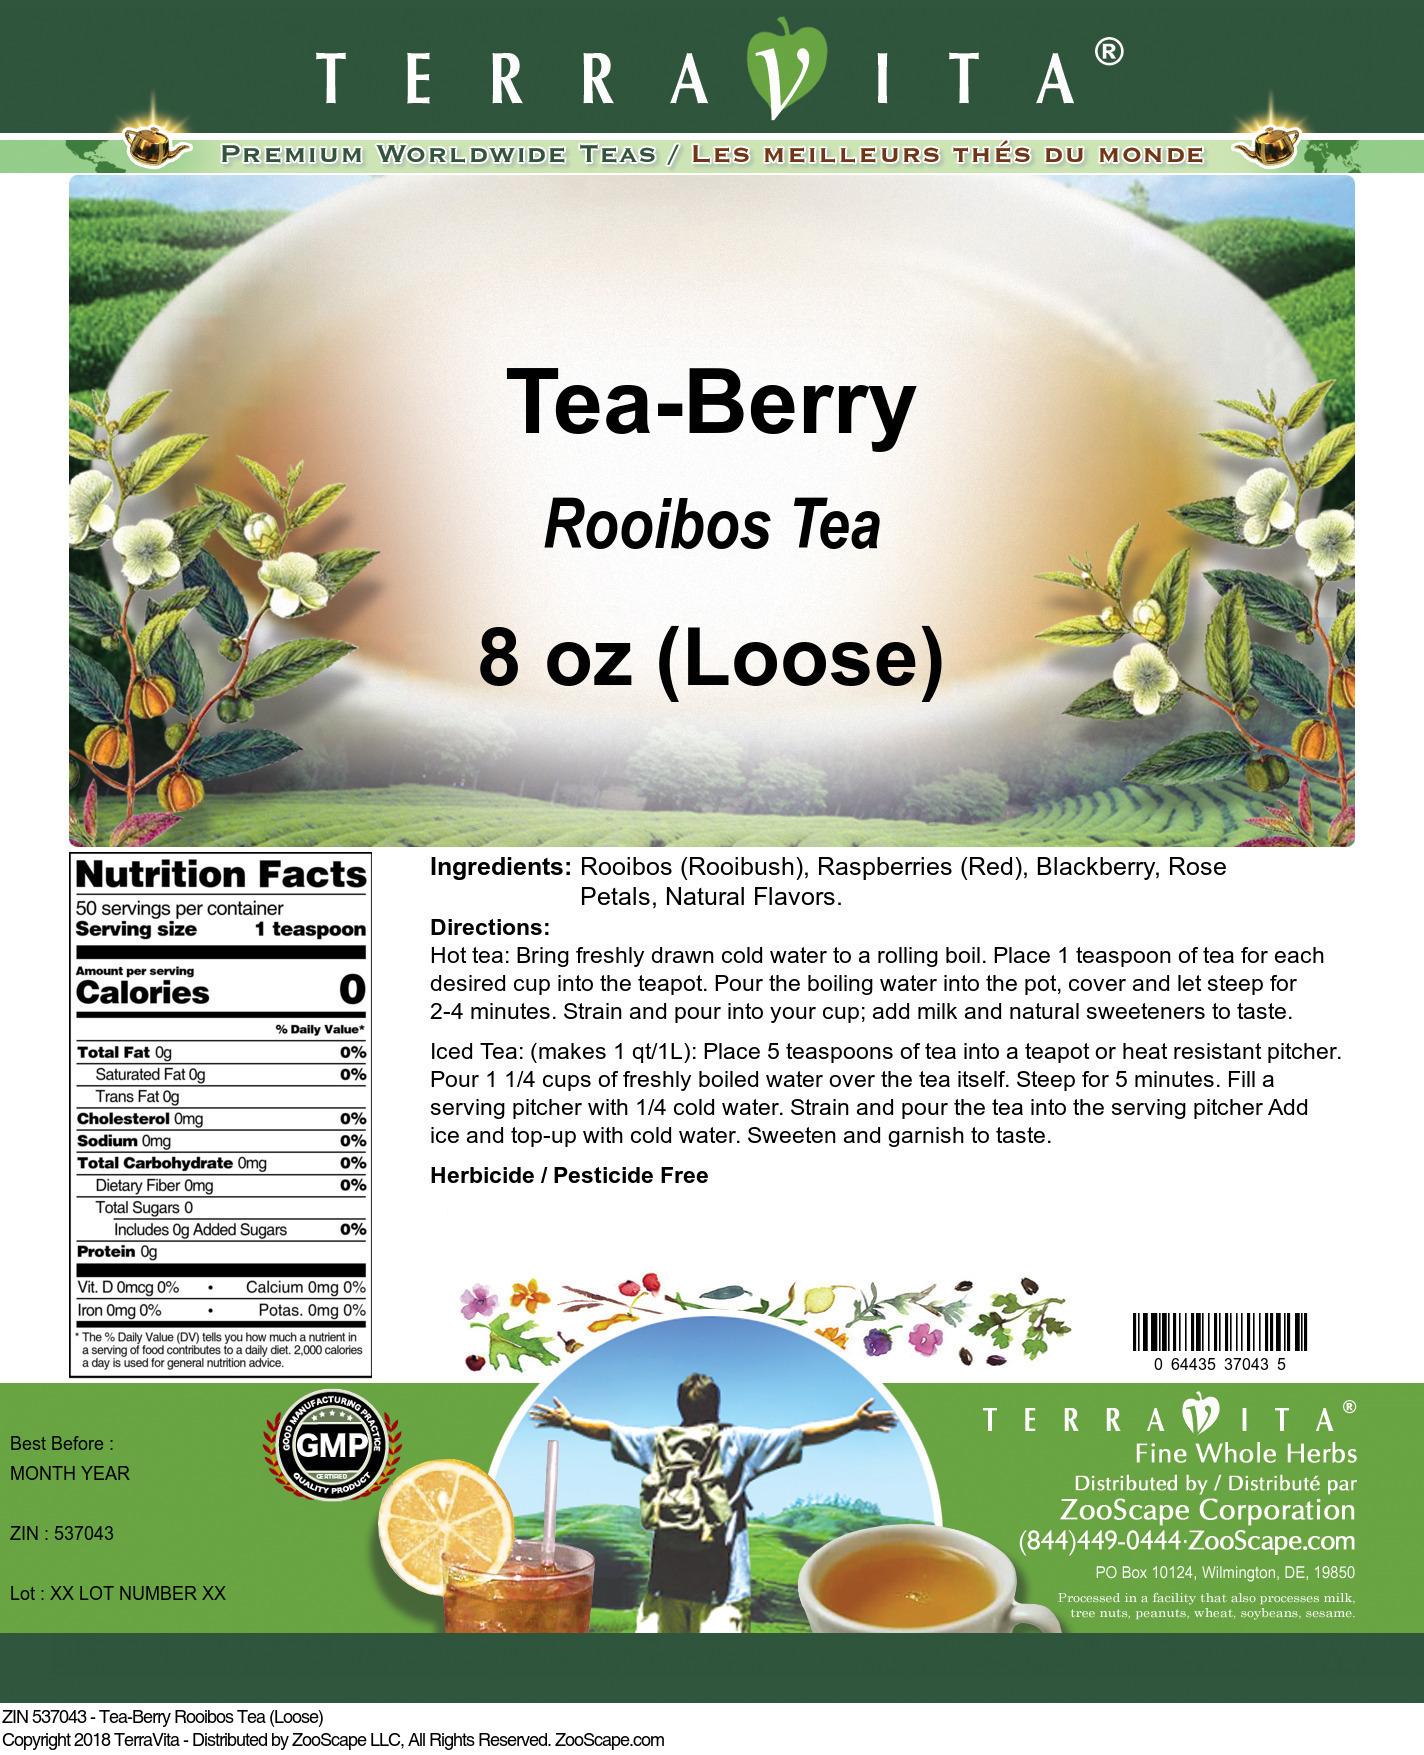 Tea-Berry Rooibos Tea